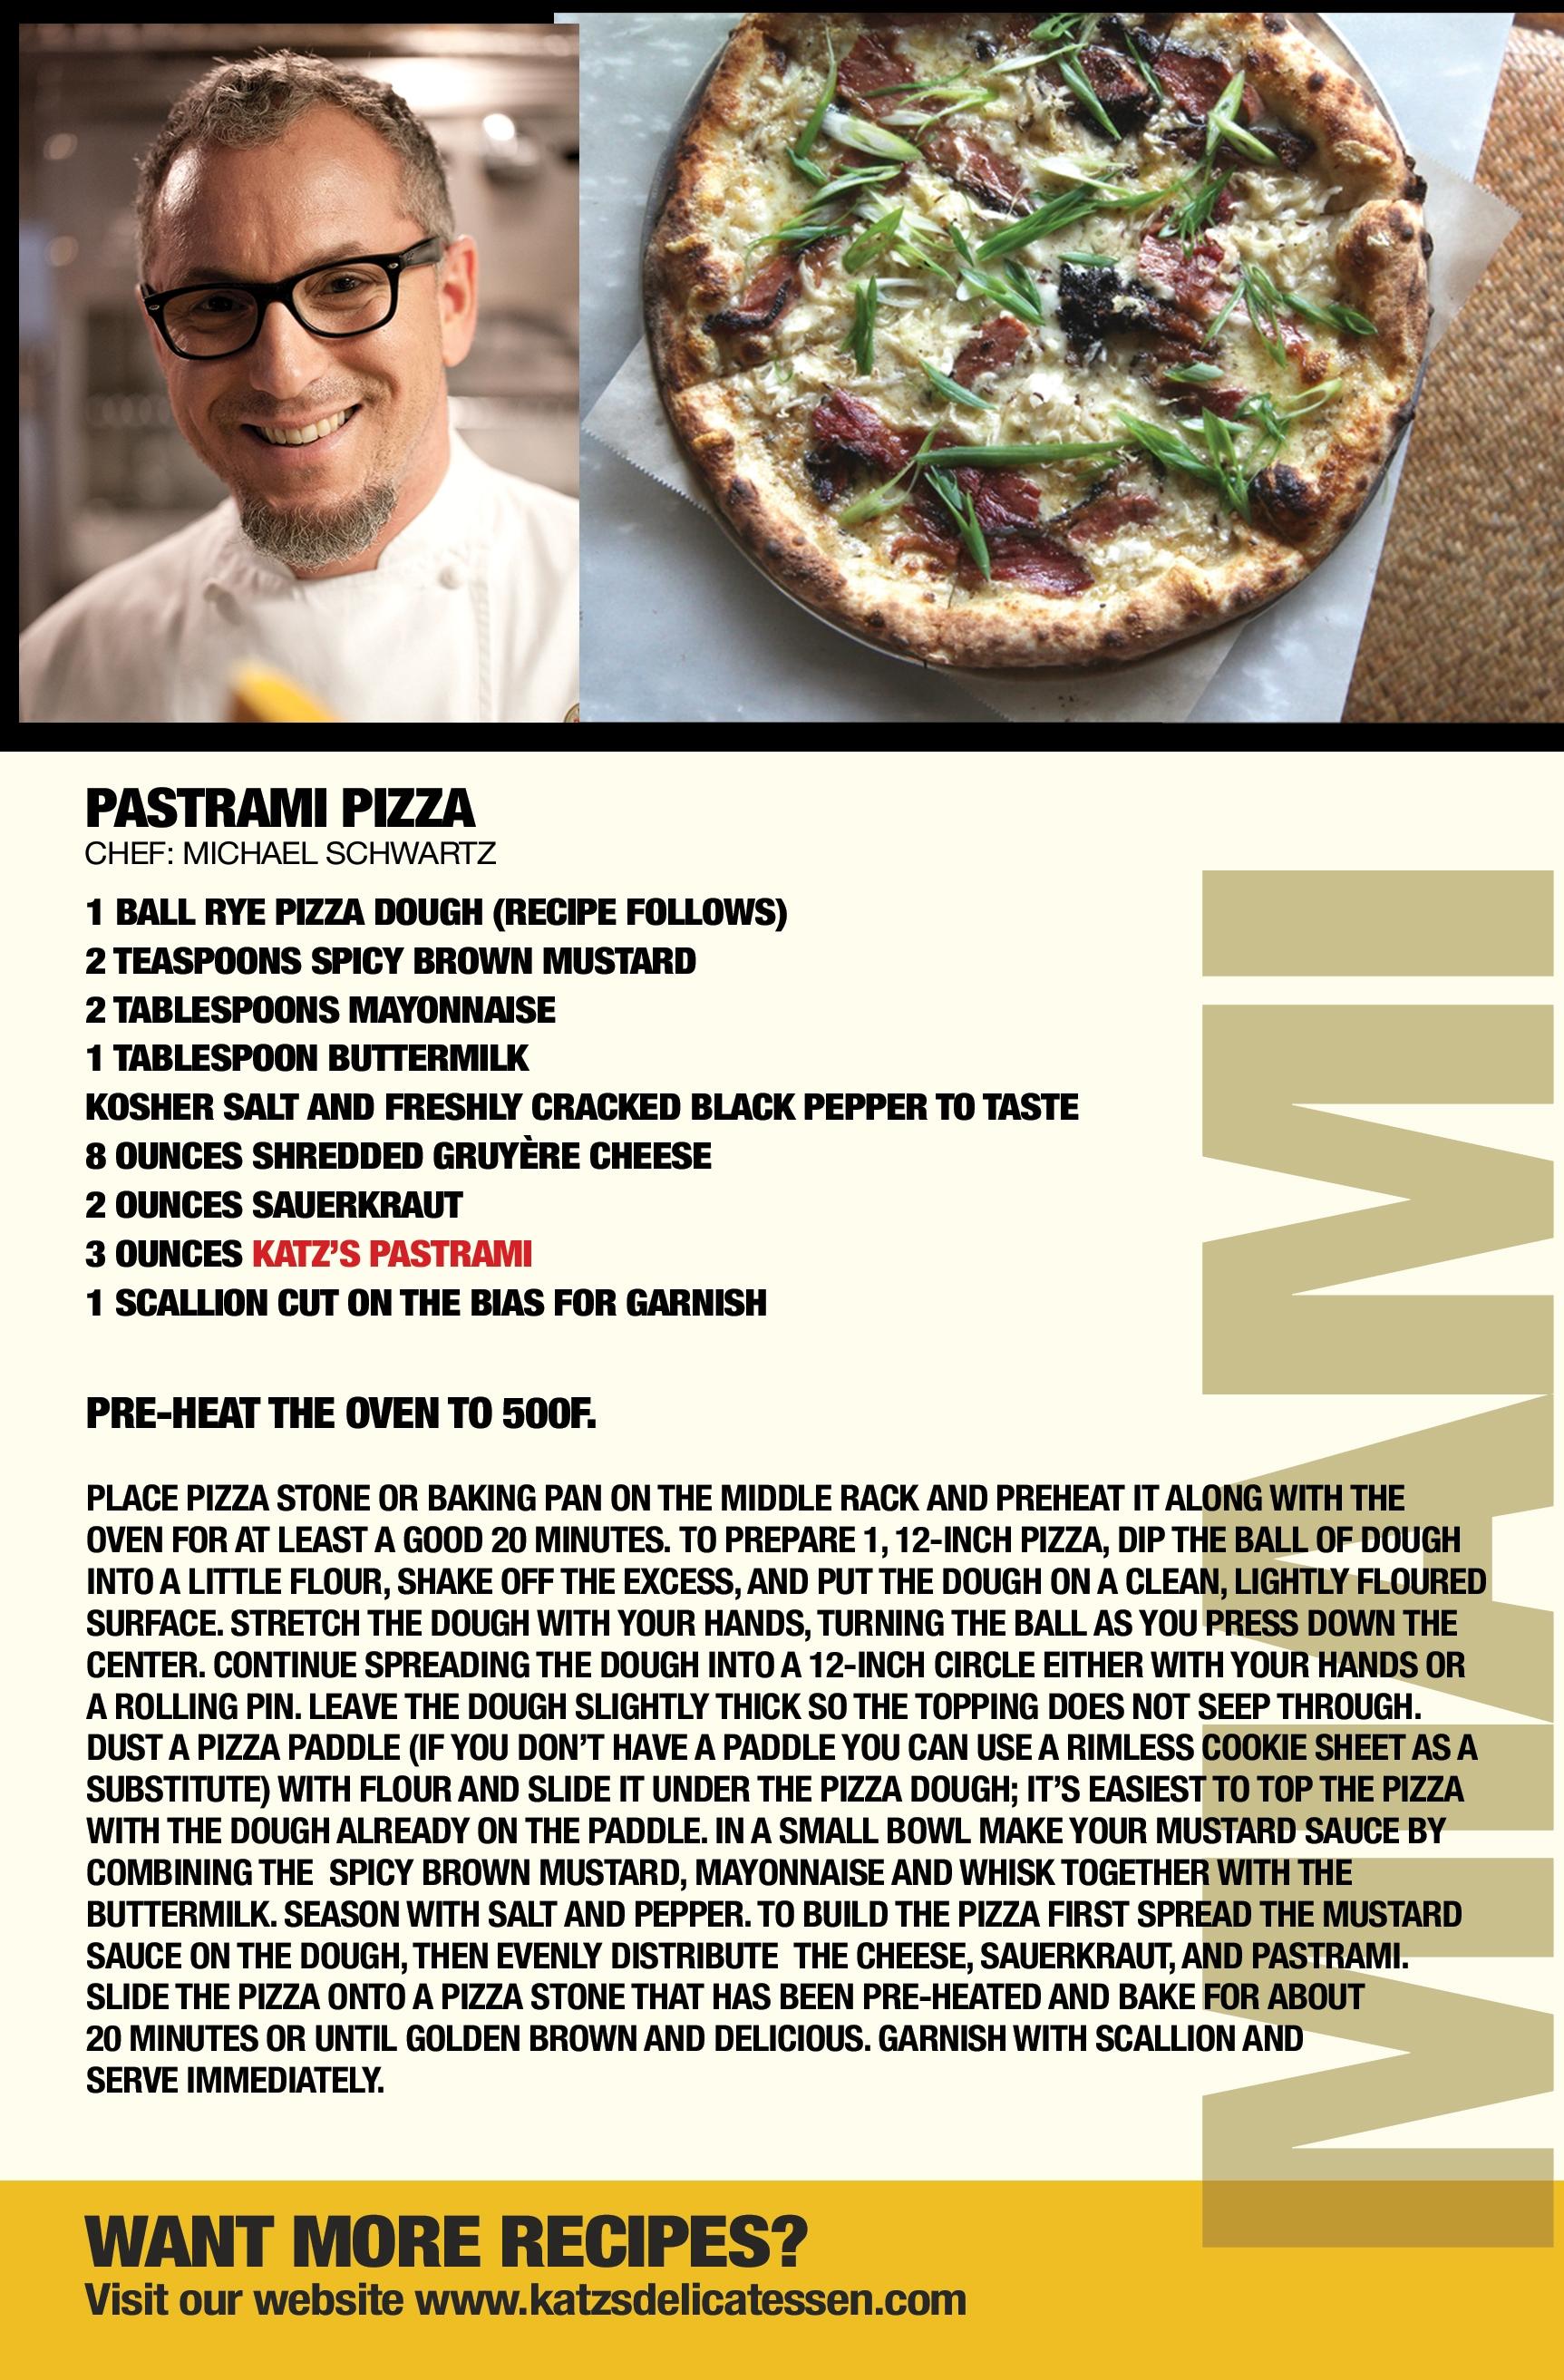 Pastrami Pizza Recipe